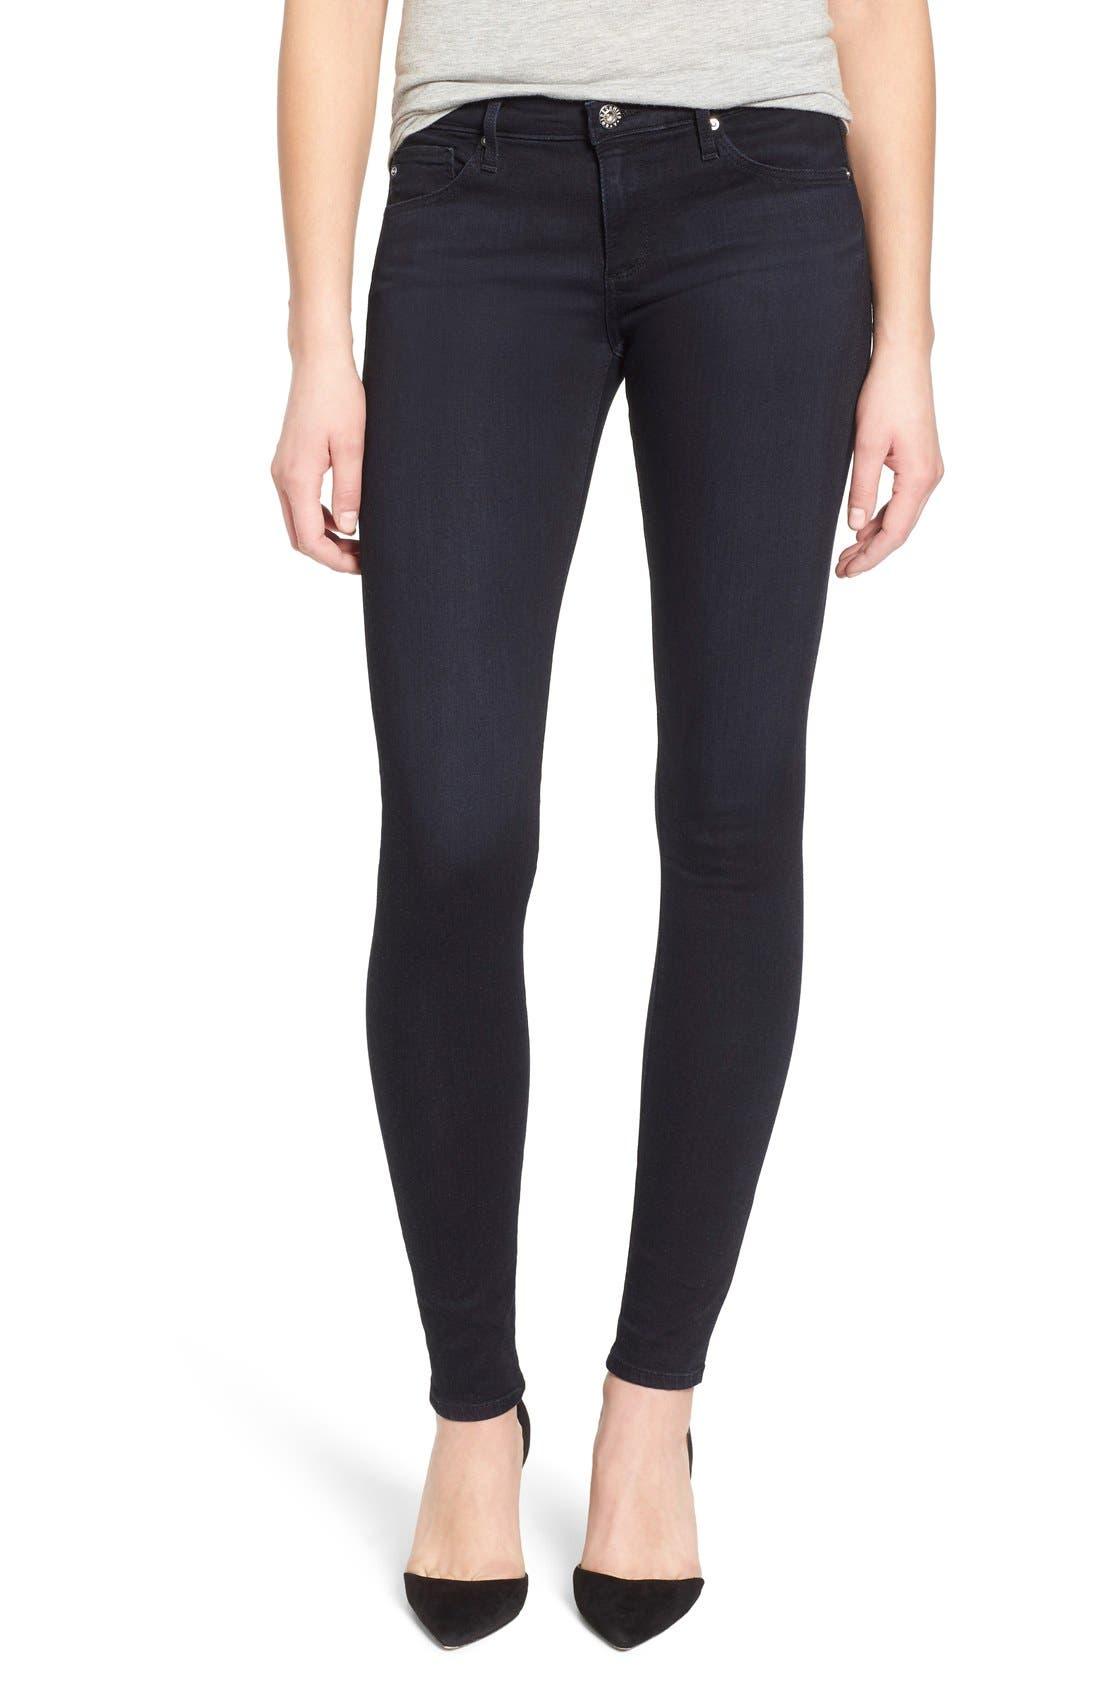 Alternate Image 1 Selected - AG 'The Legging' Super Skinny Jeans (Shade)